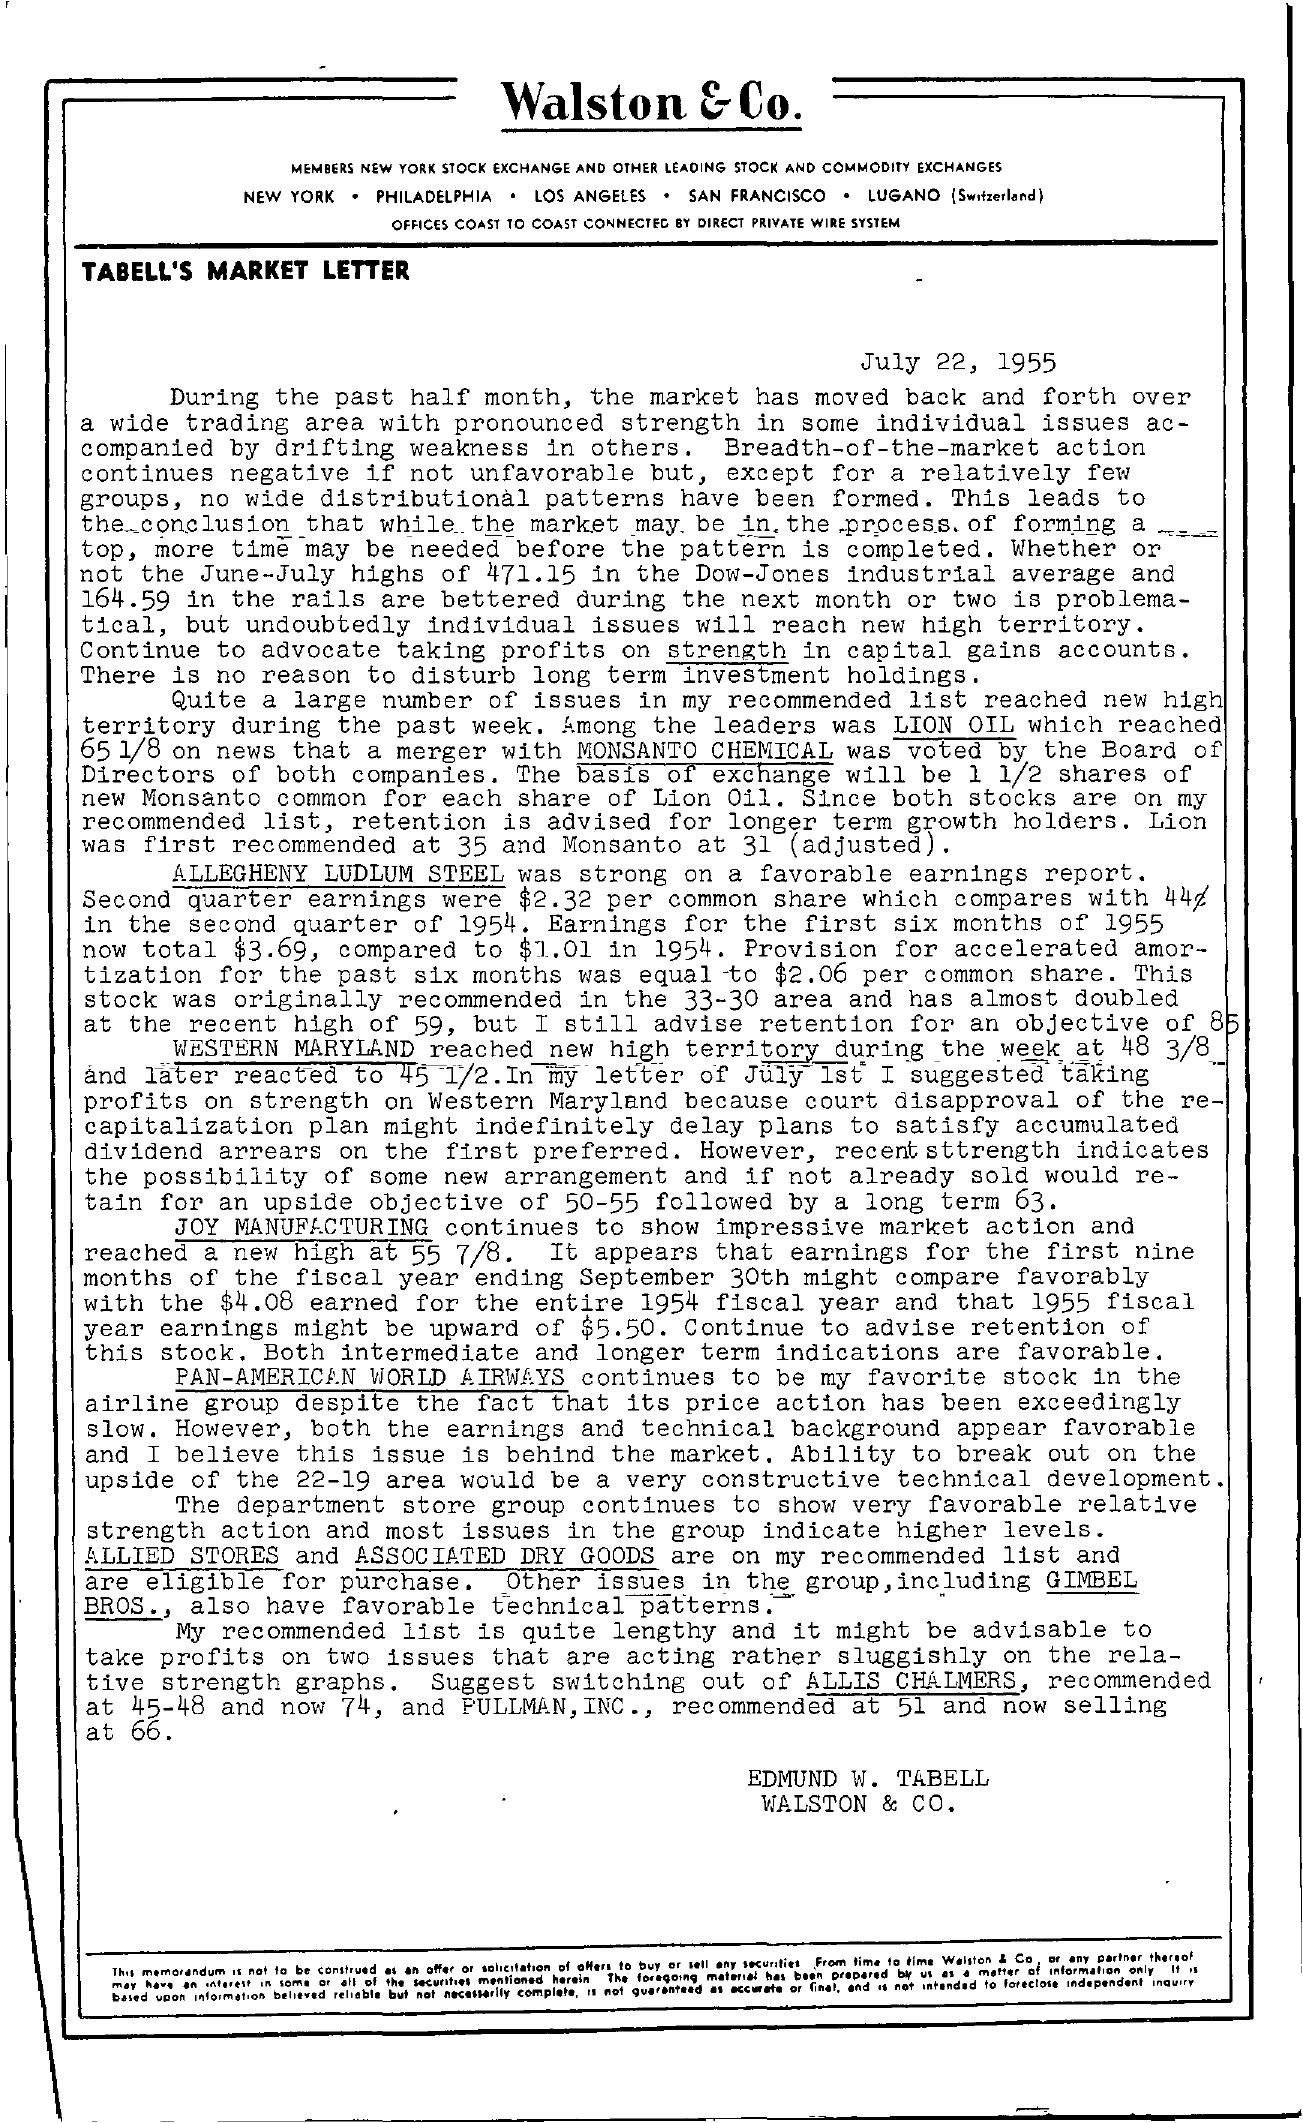 Tabell's Market Letter - July 22, 1955